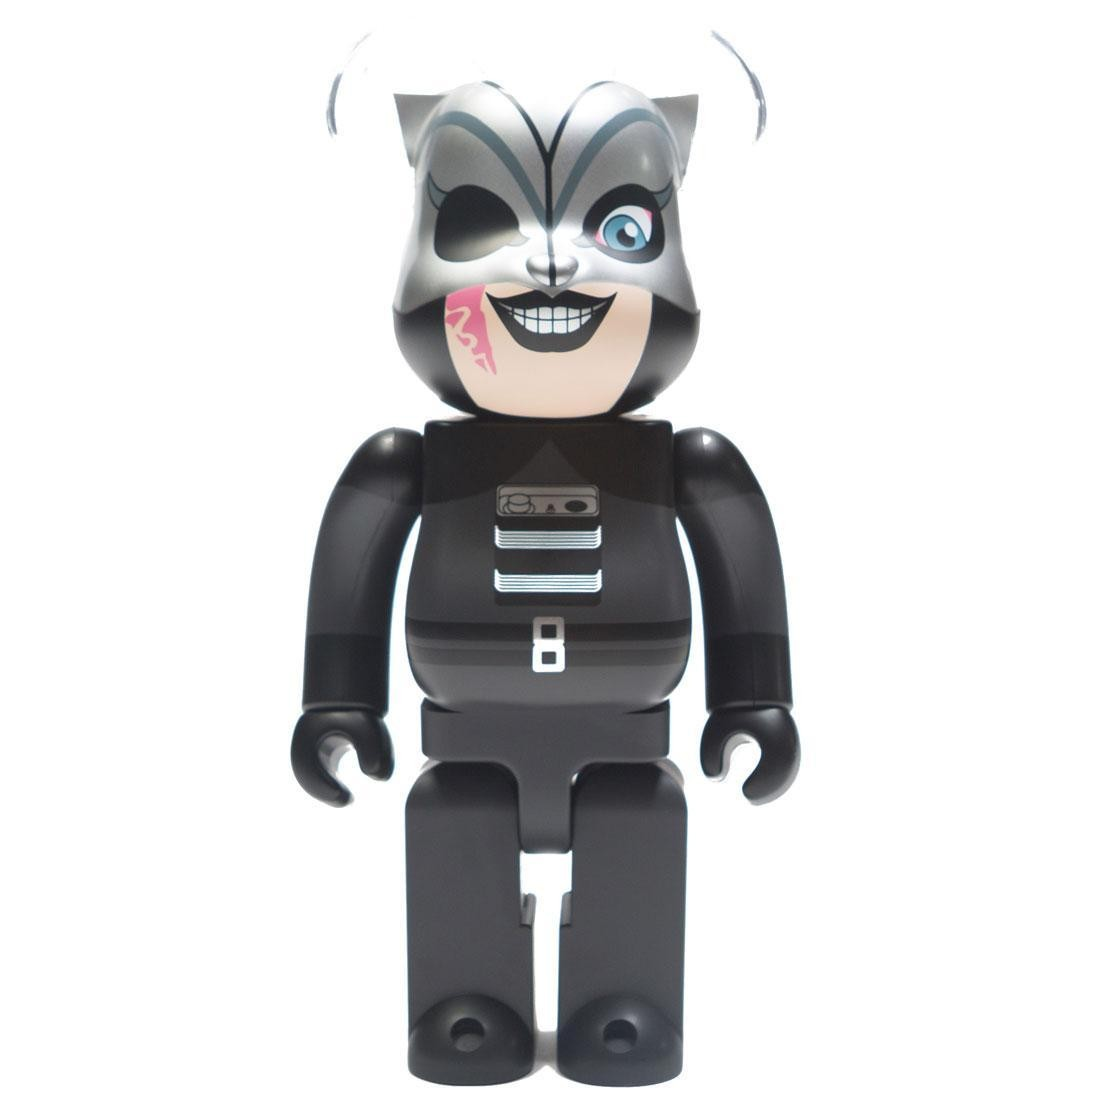 Medicom Phantom Of The Paradise Phantom 400% Bearbrick Figure (black)